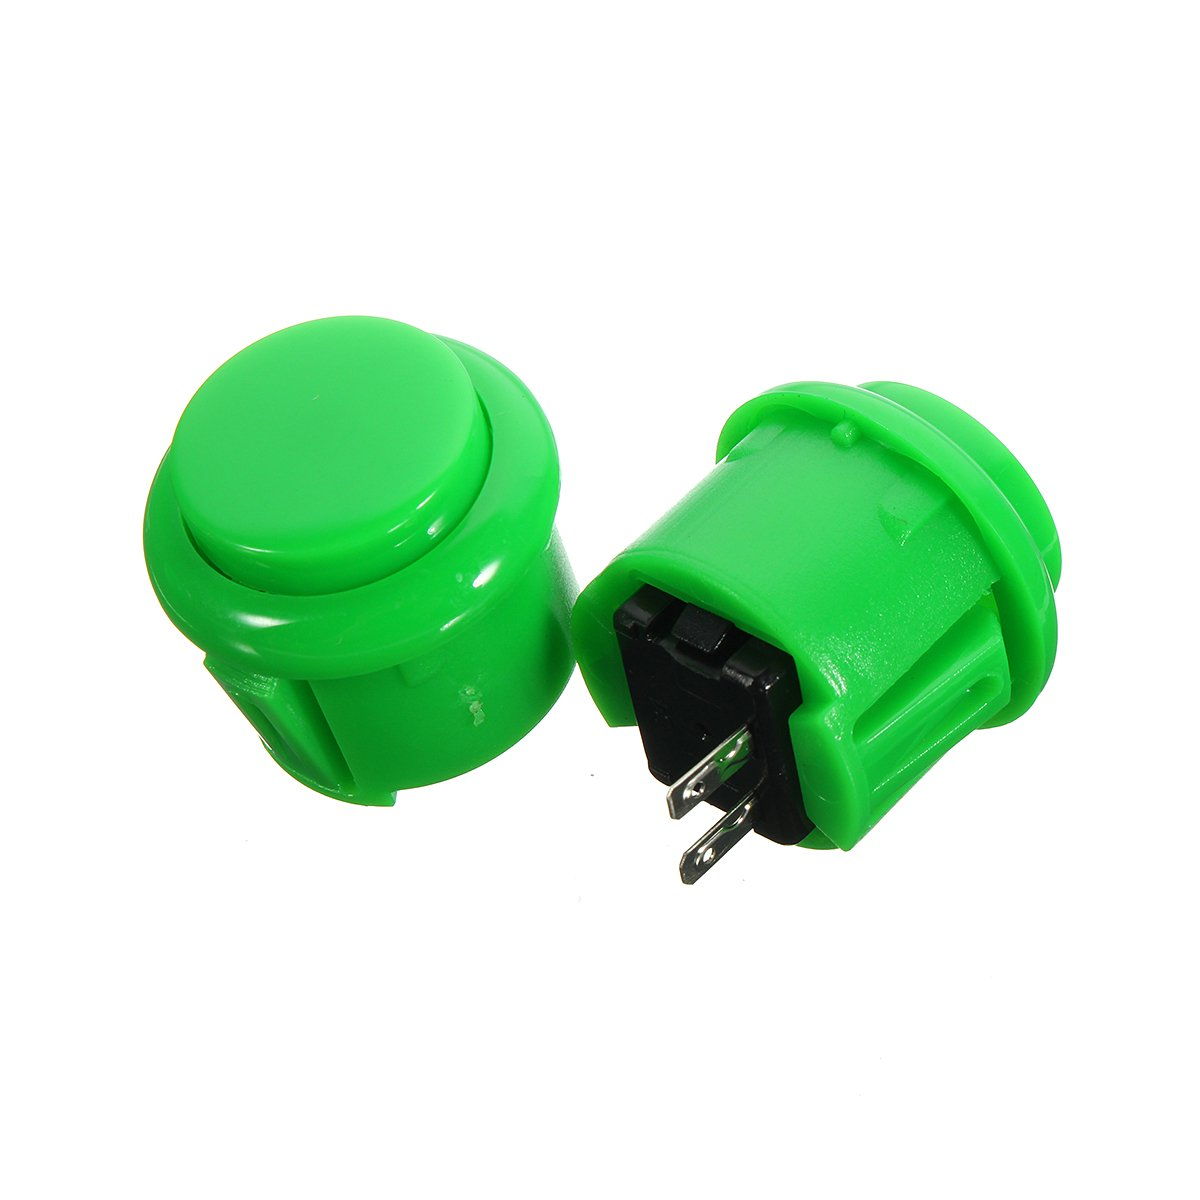 28Pcs Zero Delay Arcade Game Controller USB Joystick Kit for MAME